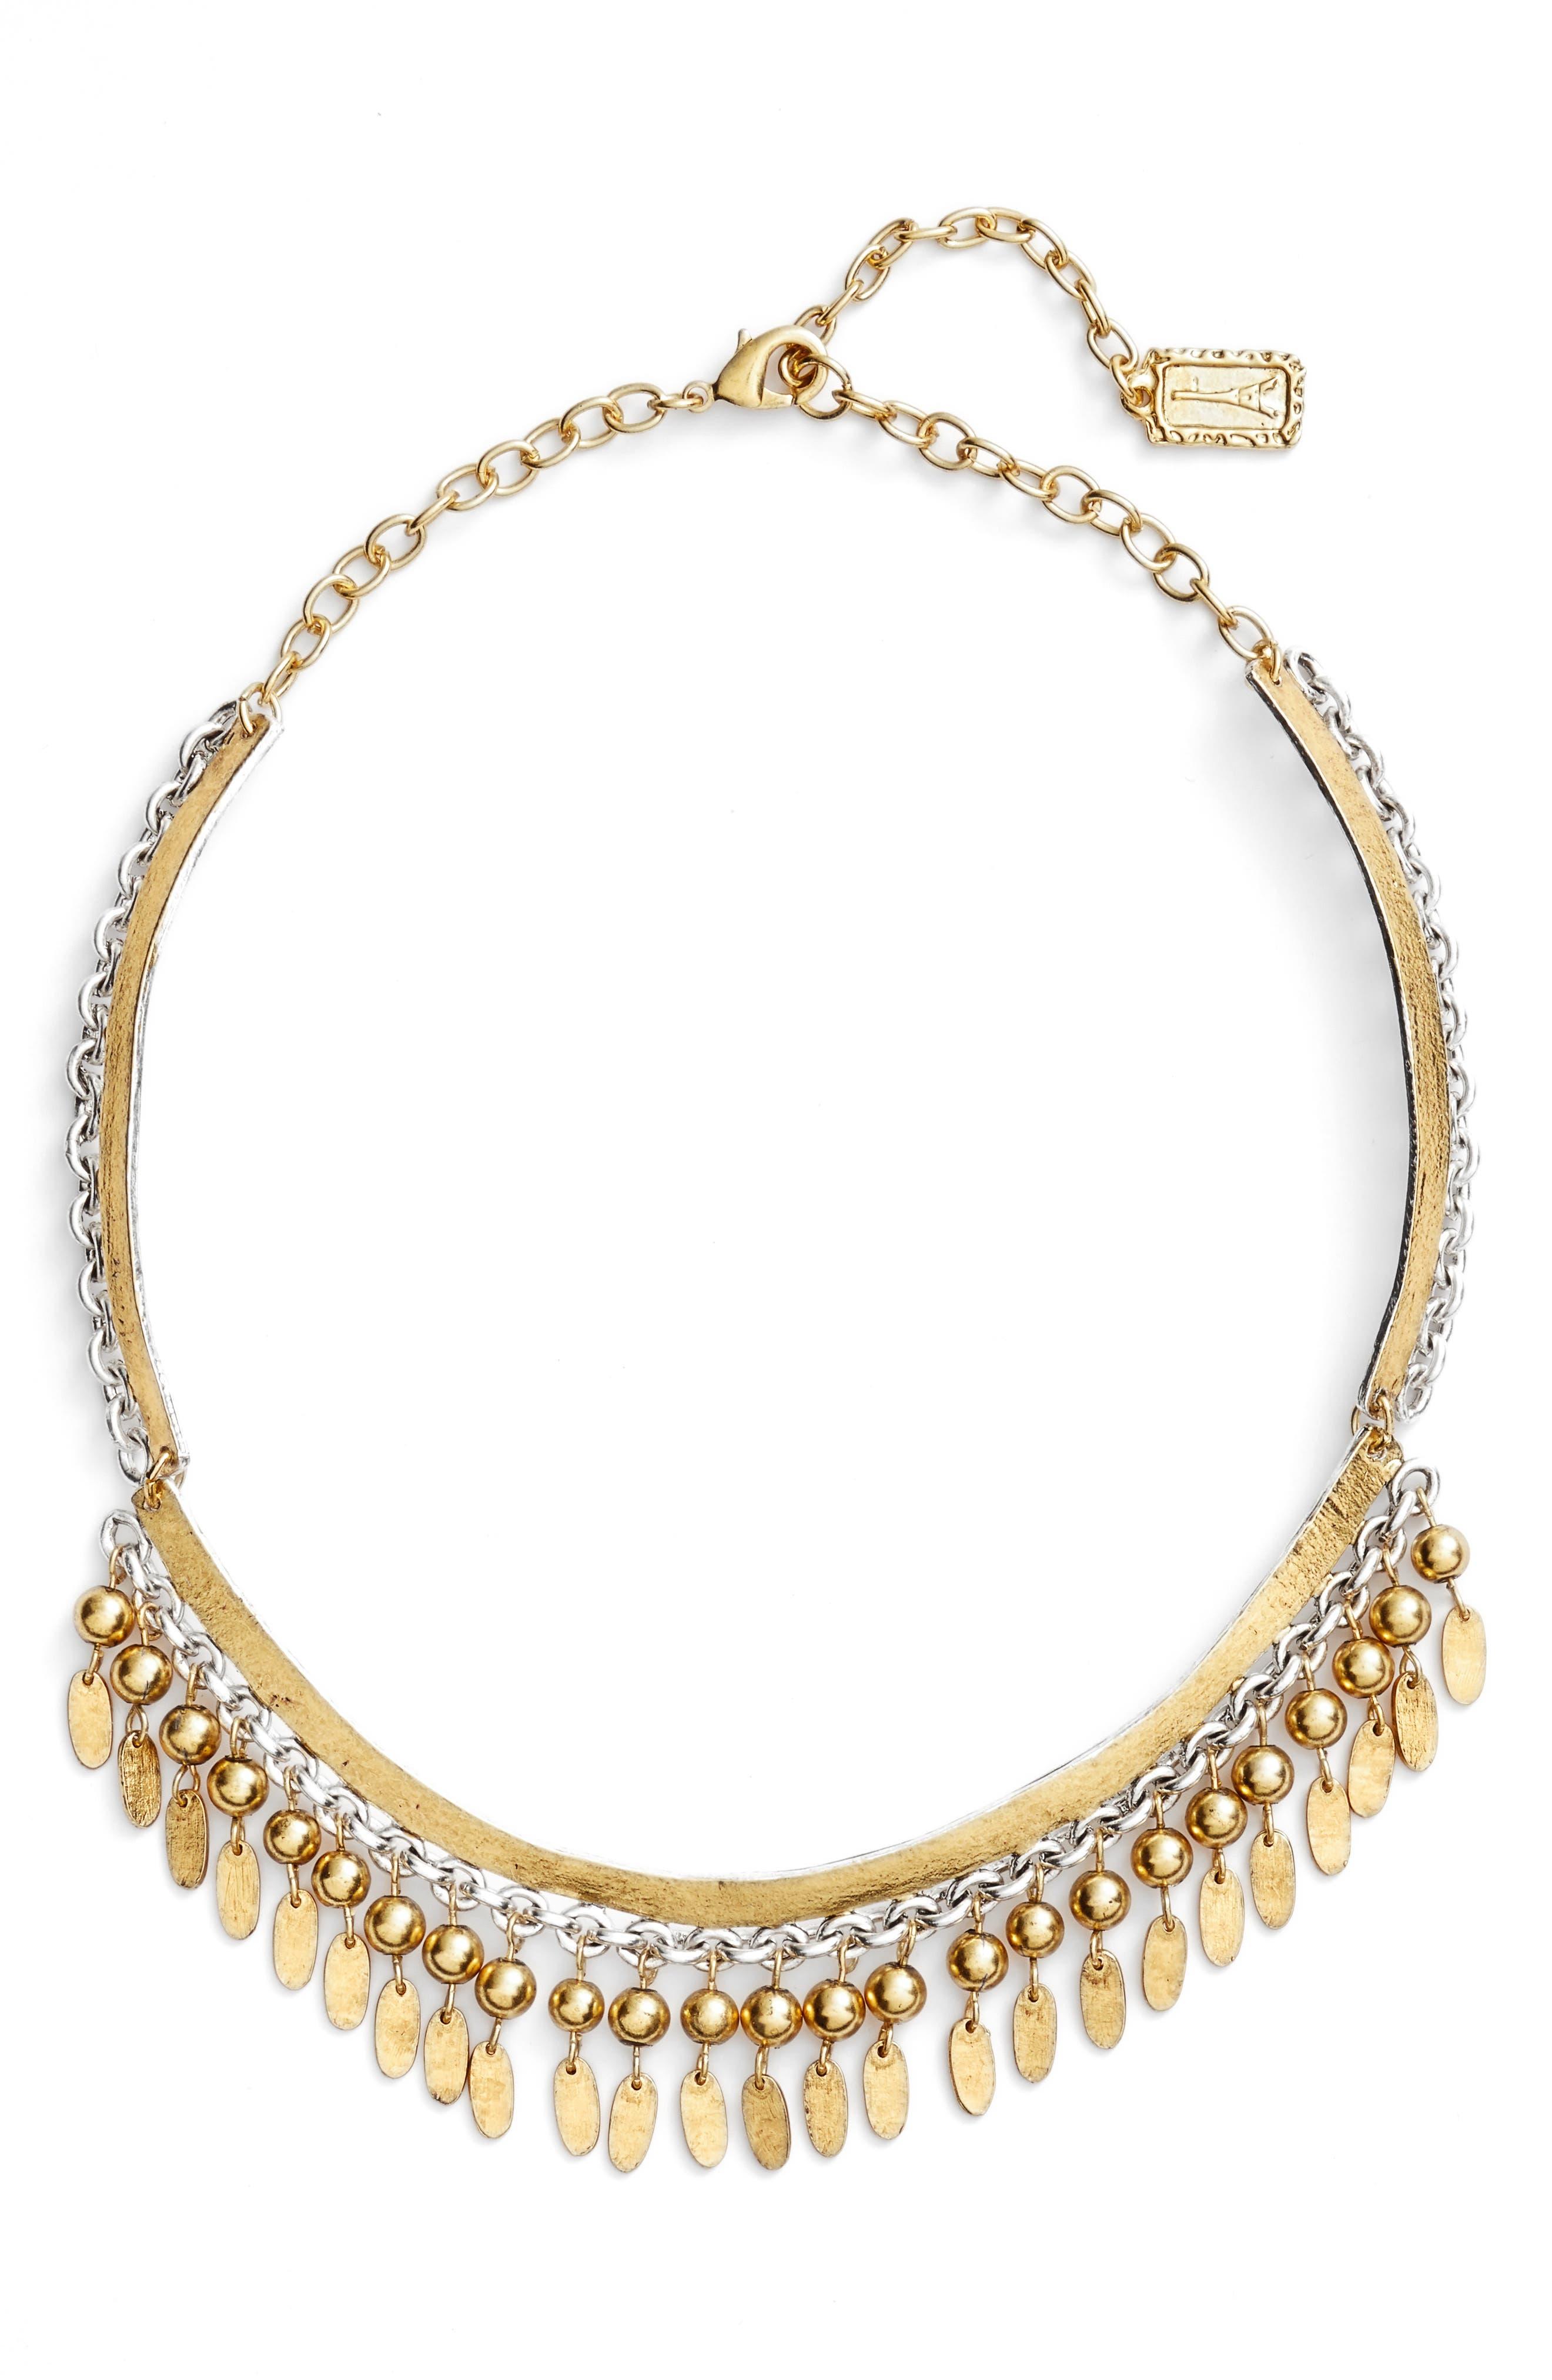 KARINE SULTAN Fringe Collar Necklace, Main, color, GOLD/SILVER MIX